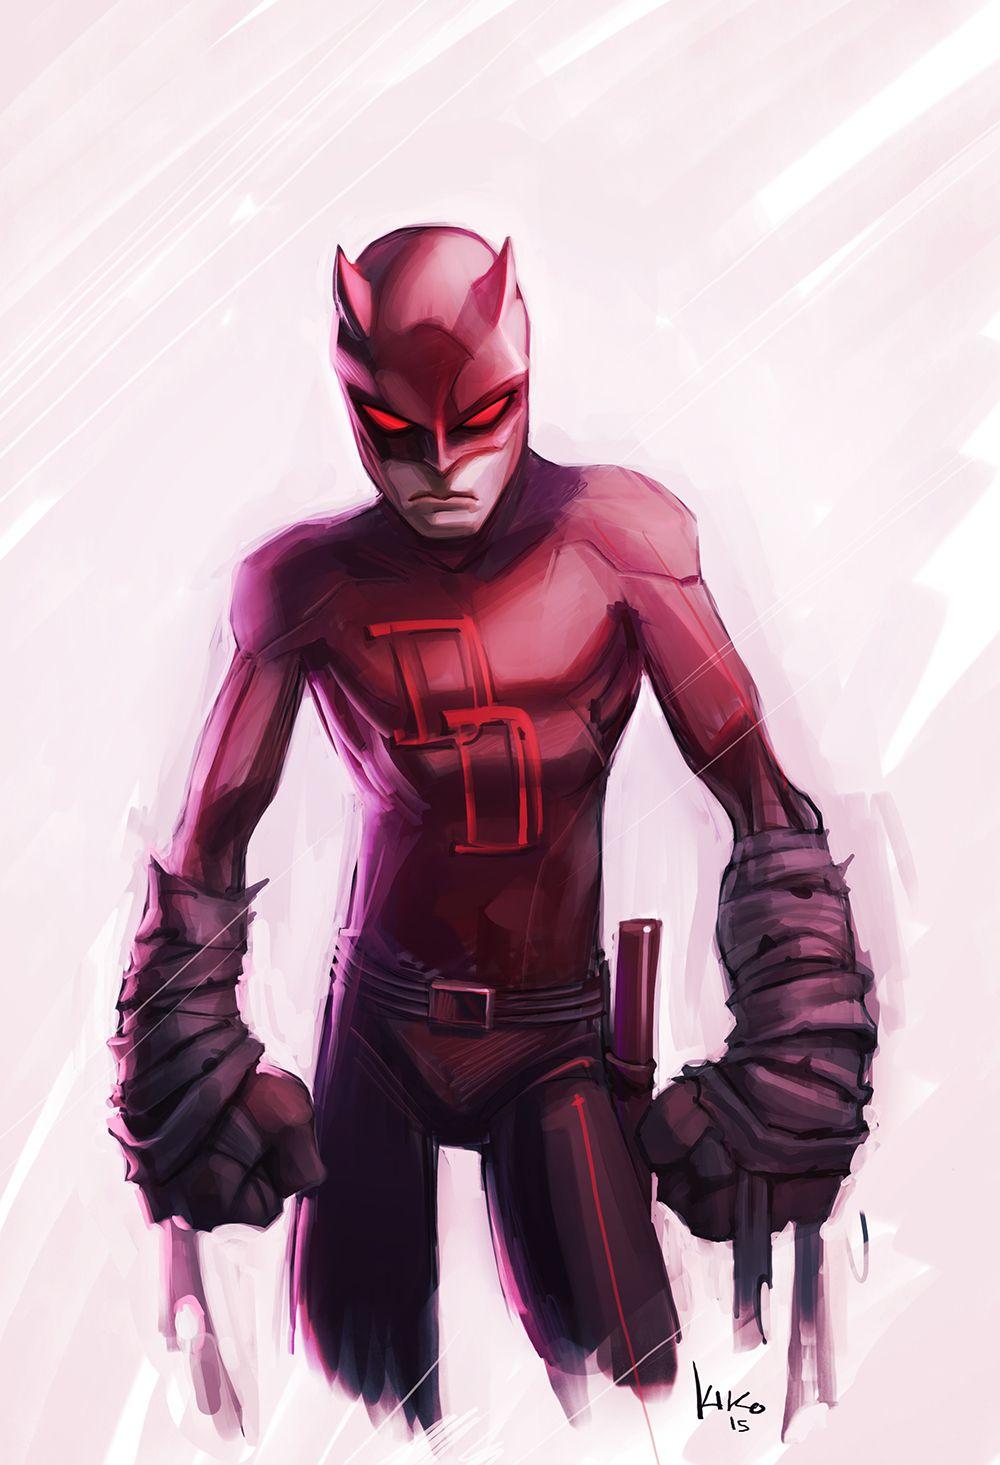 Daredevil - Cartoon Style